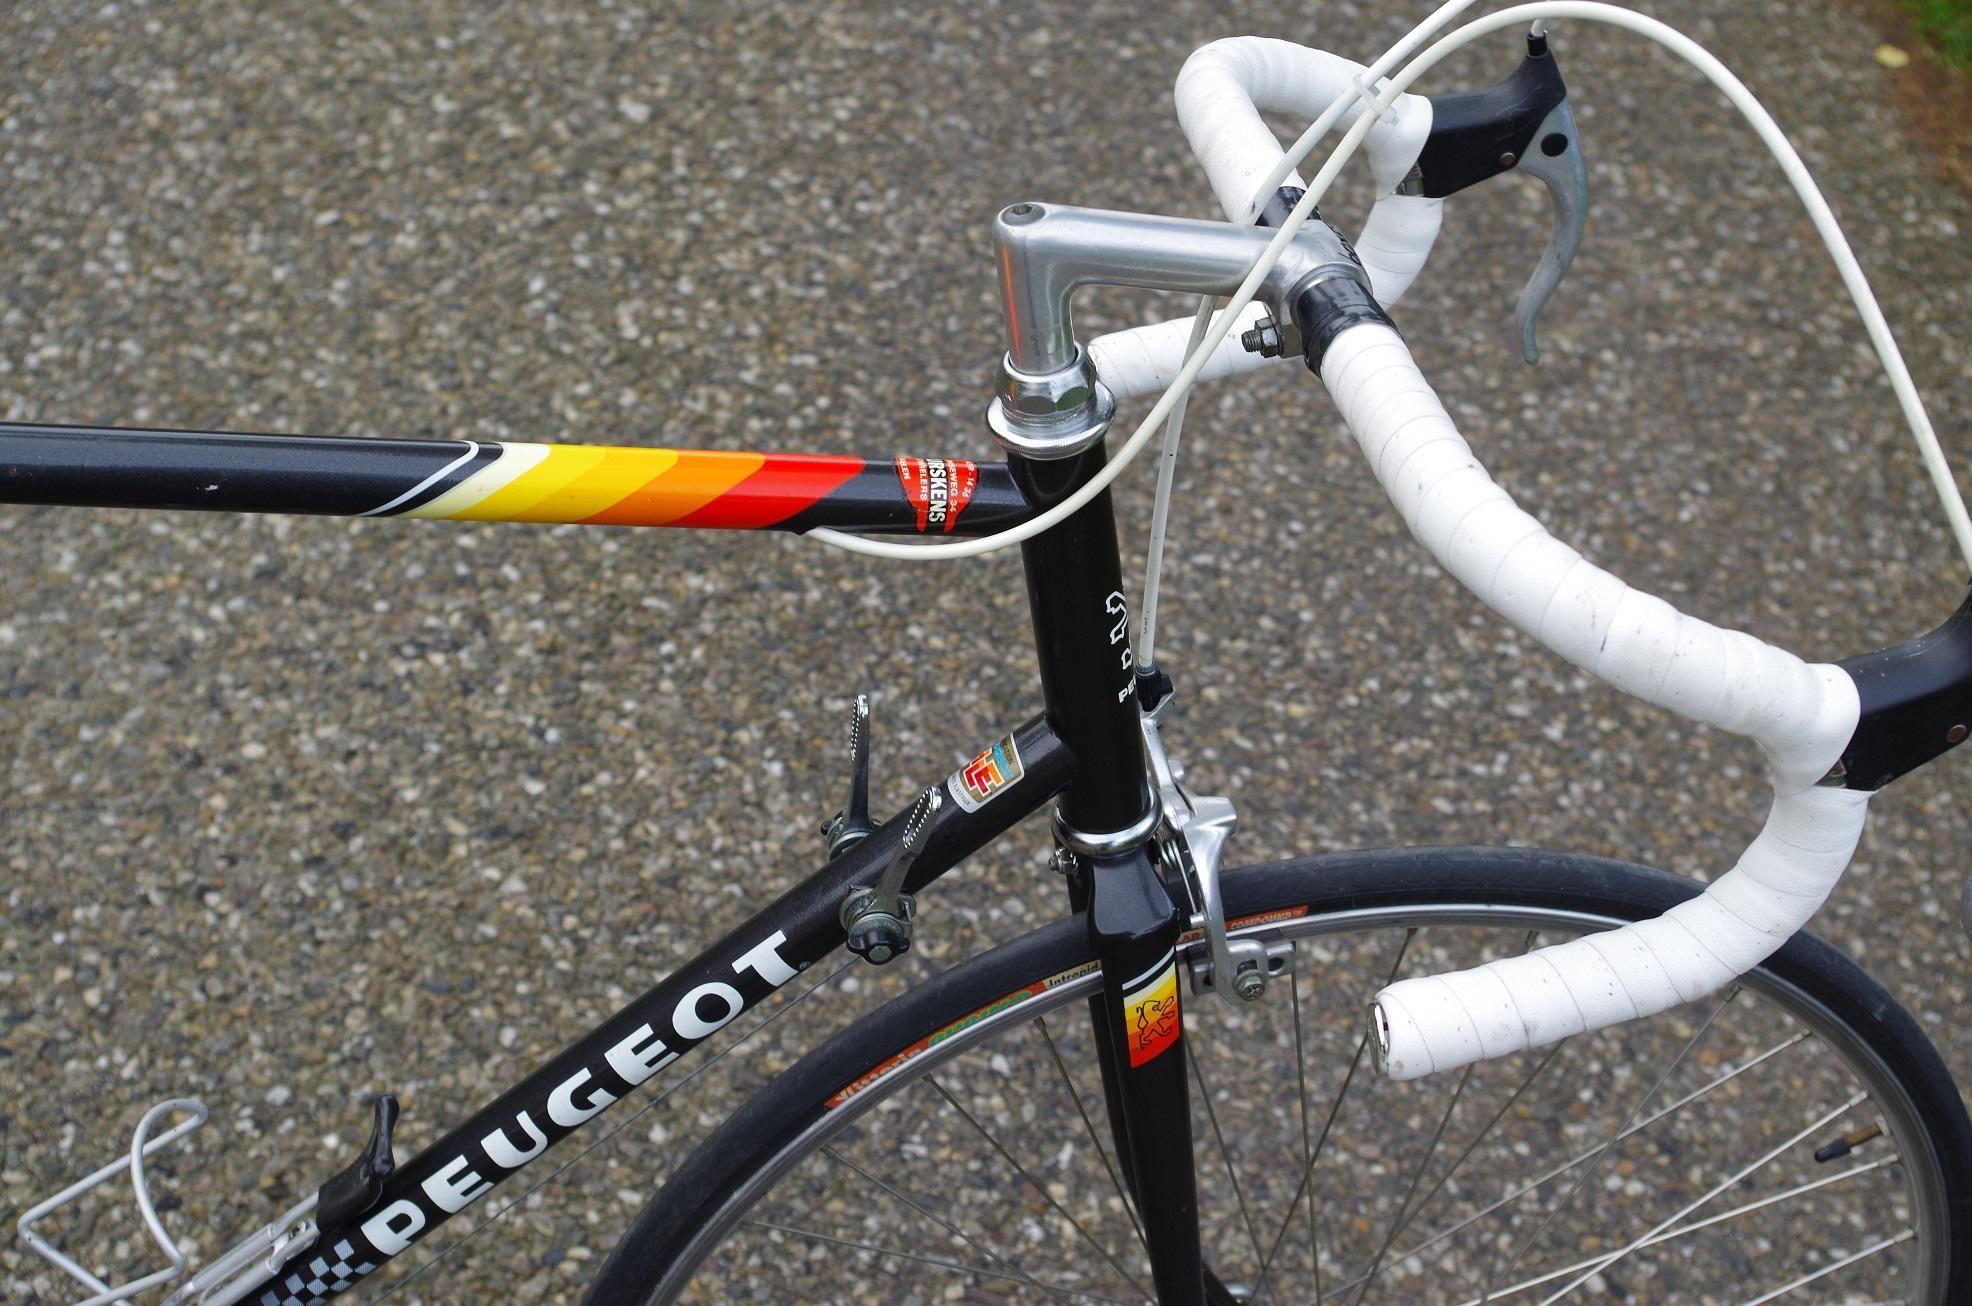 for sale: peugeot aubisque full bike 60x58cm =vgc= | lfgss | road